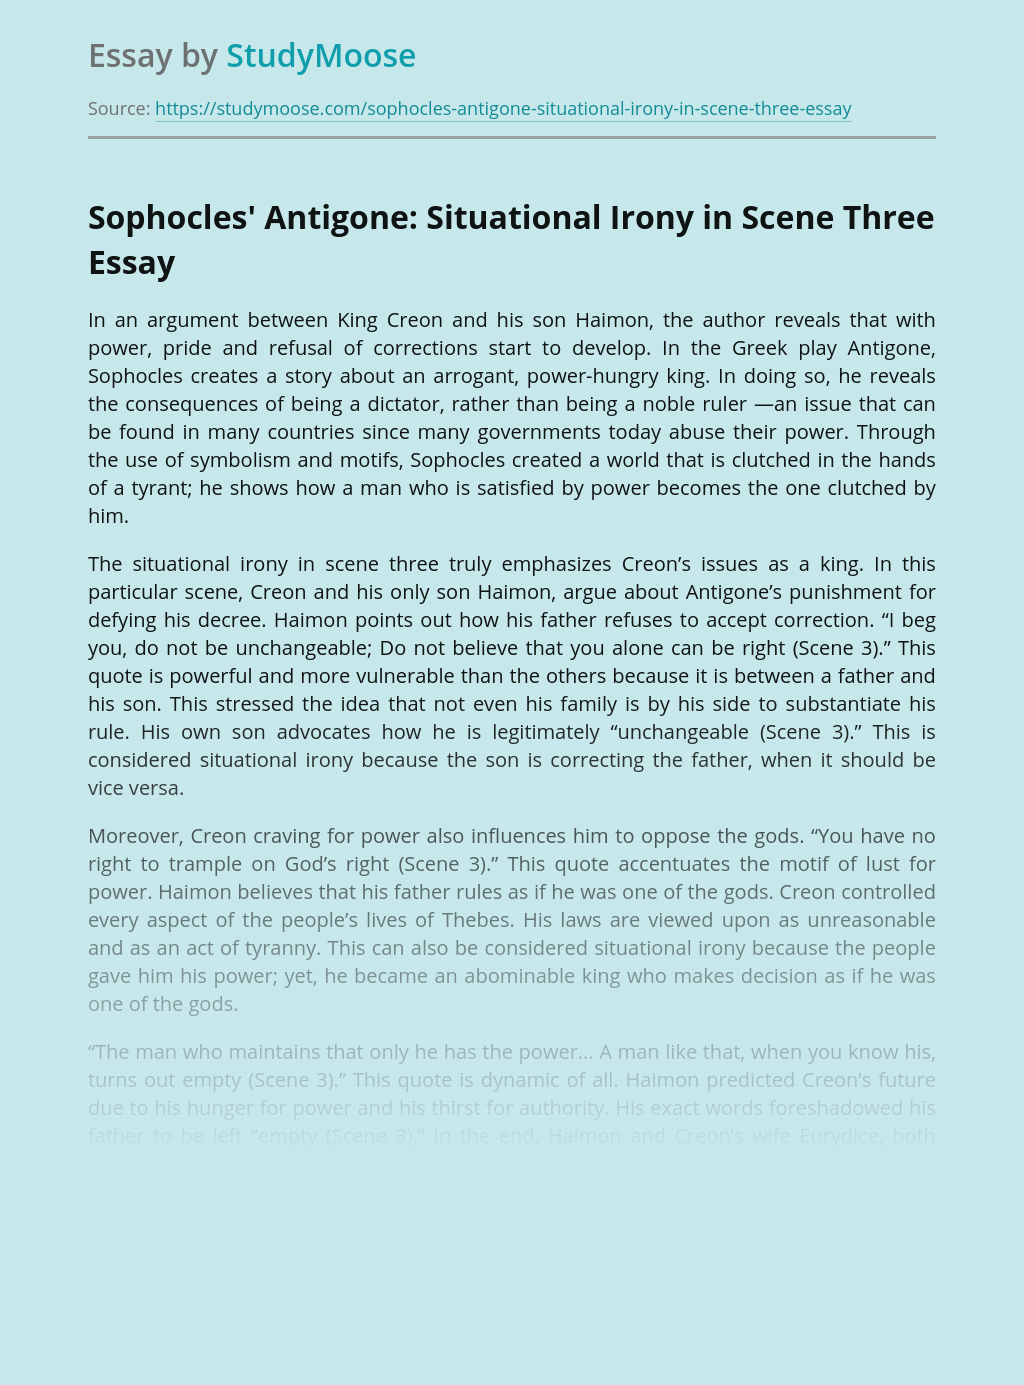 Sophocles' Antigone: Situational Irony in Scene Three